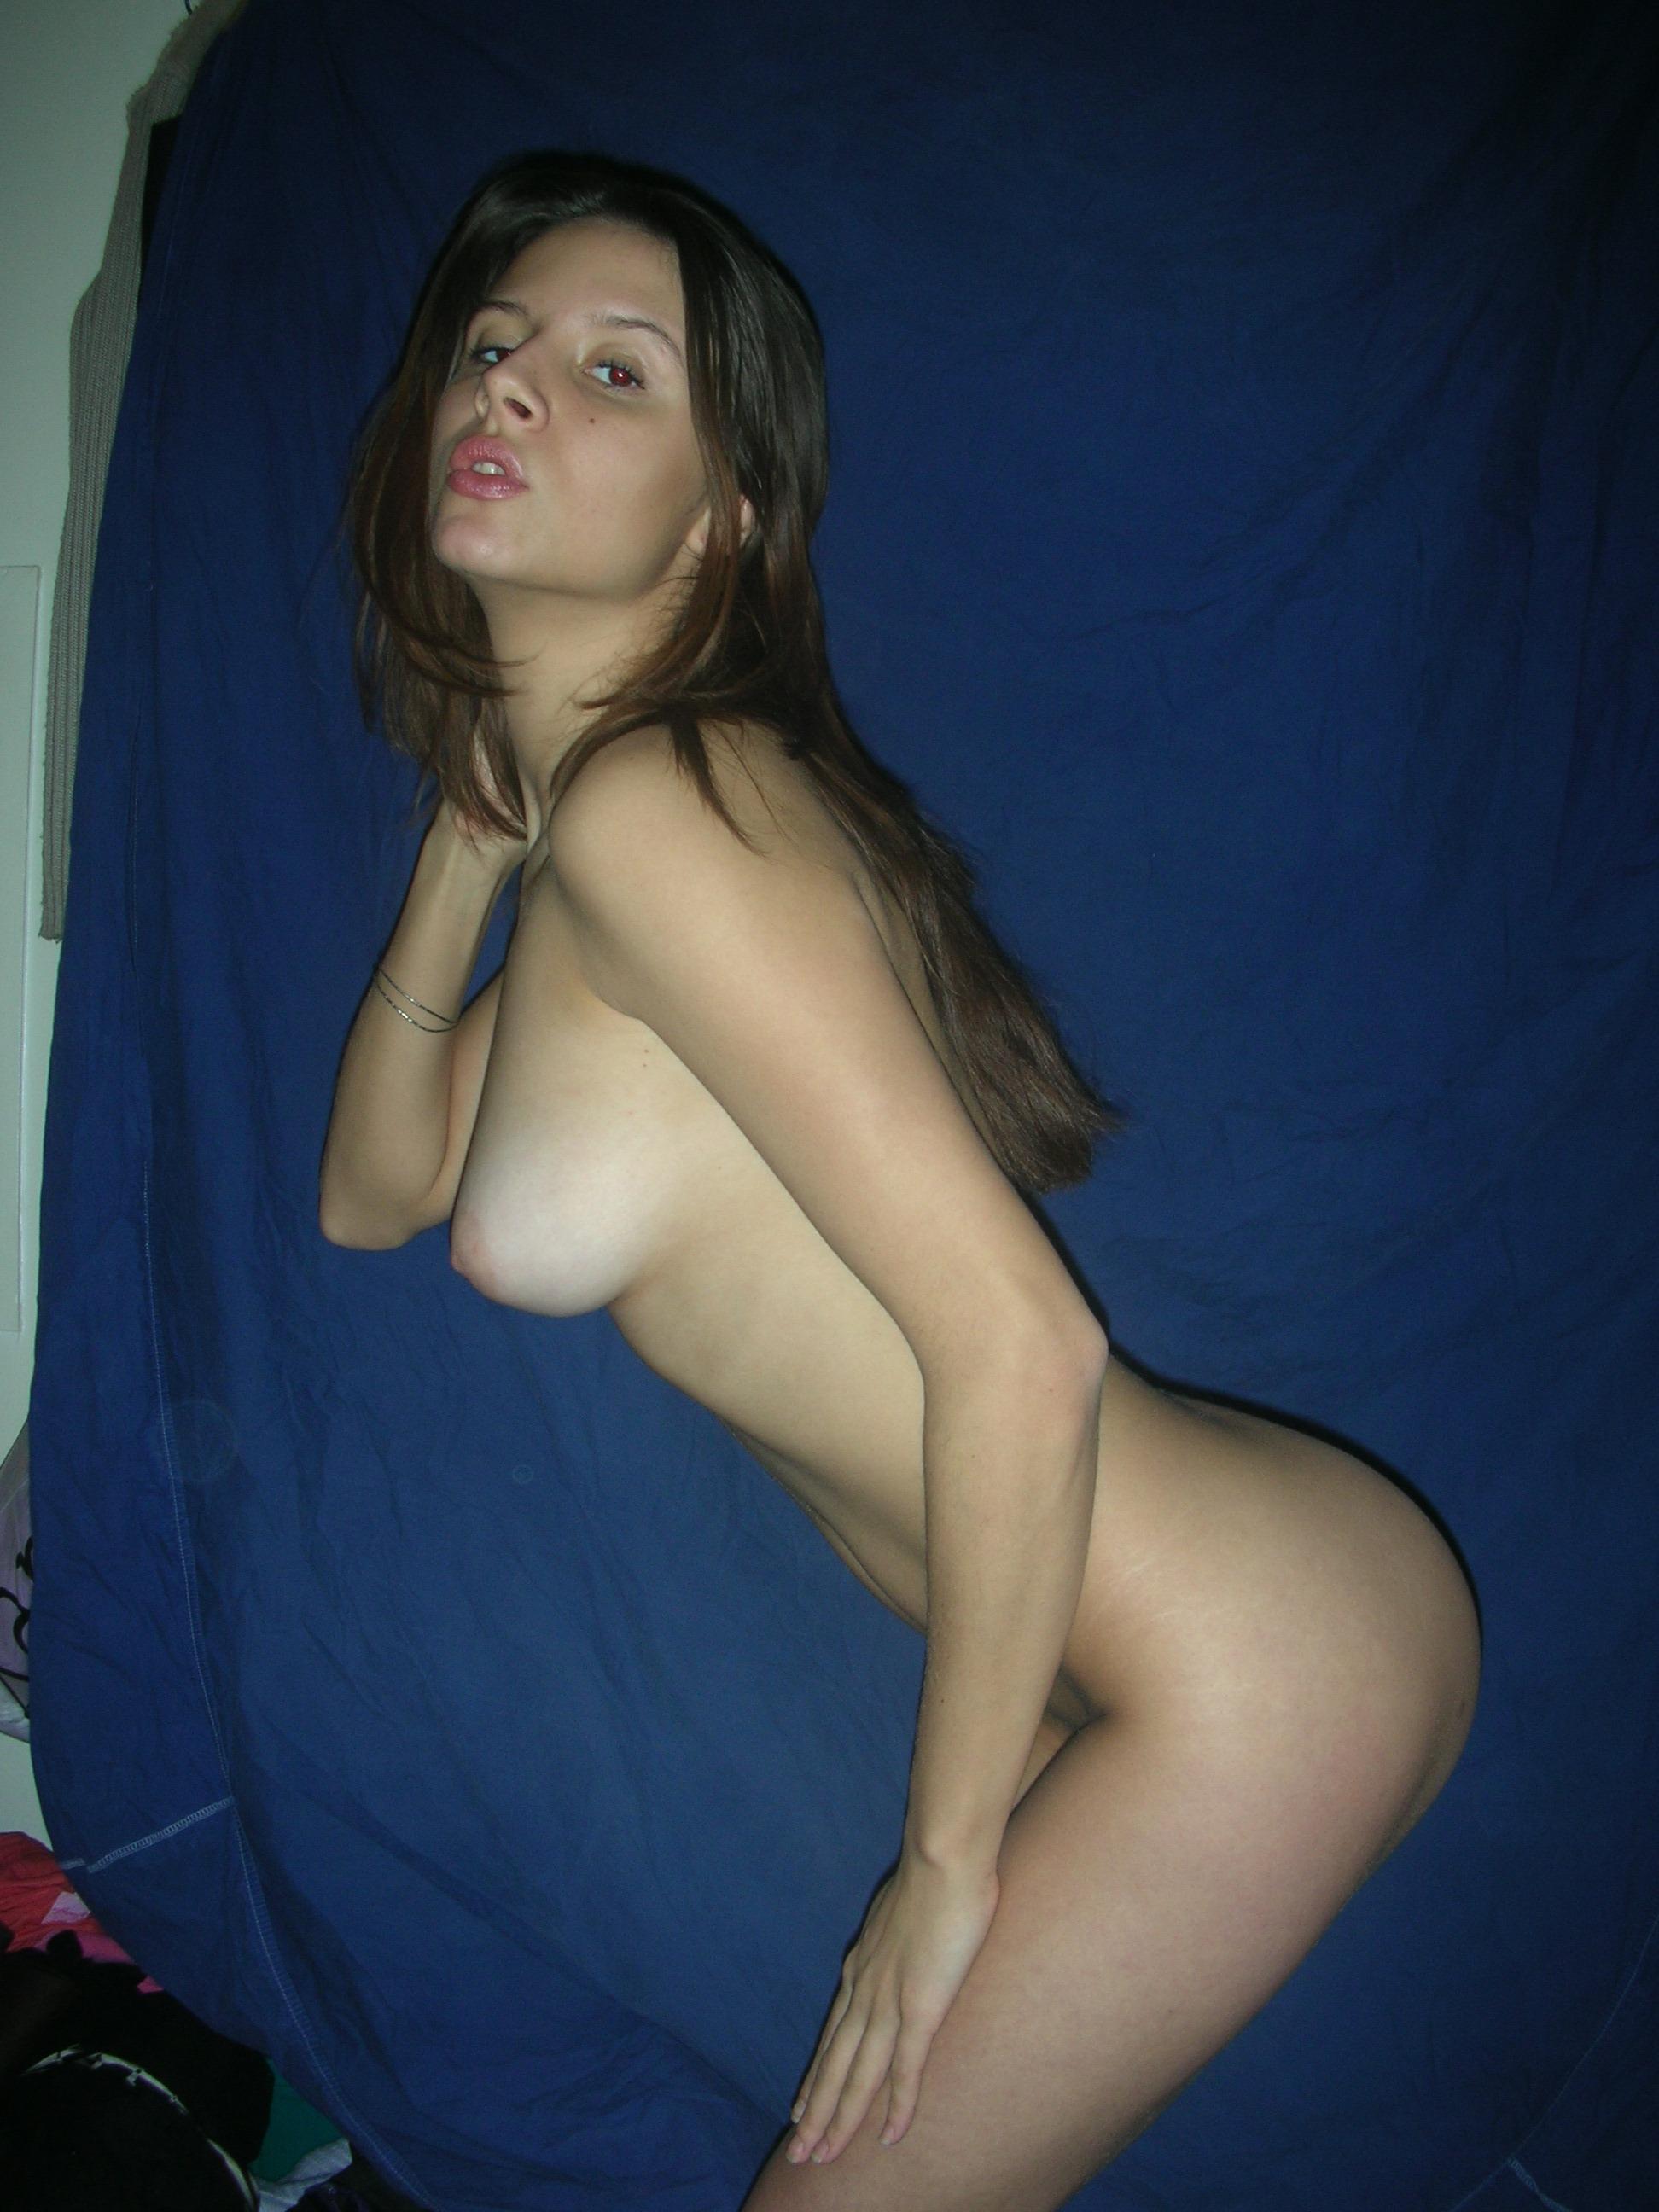 Hot amateur gf pics